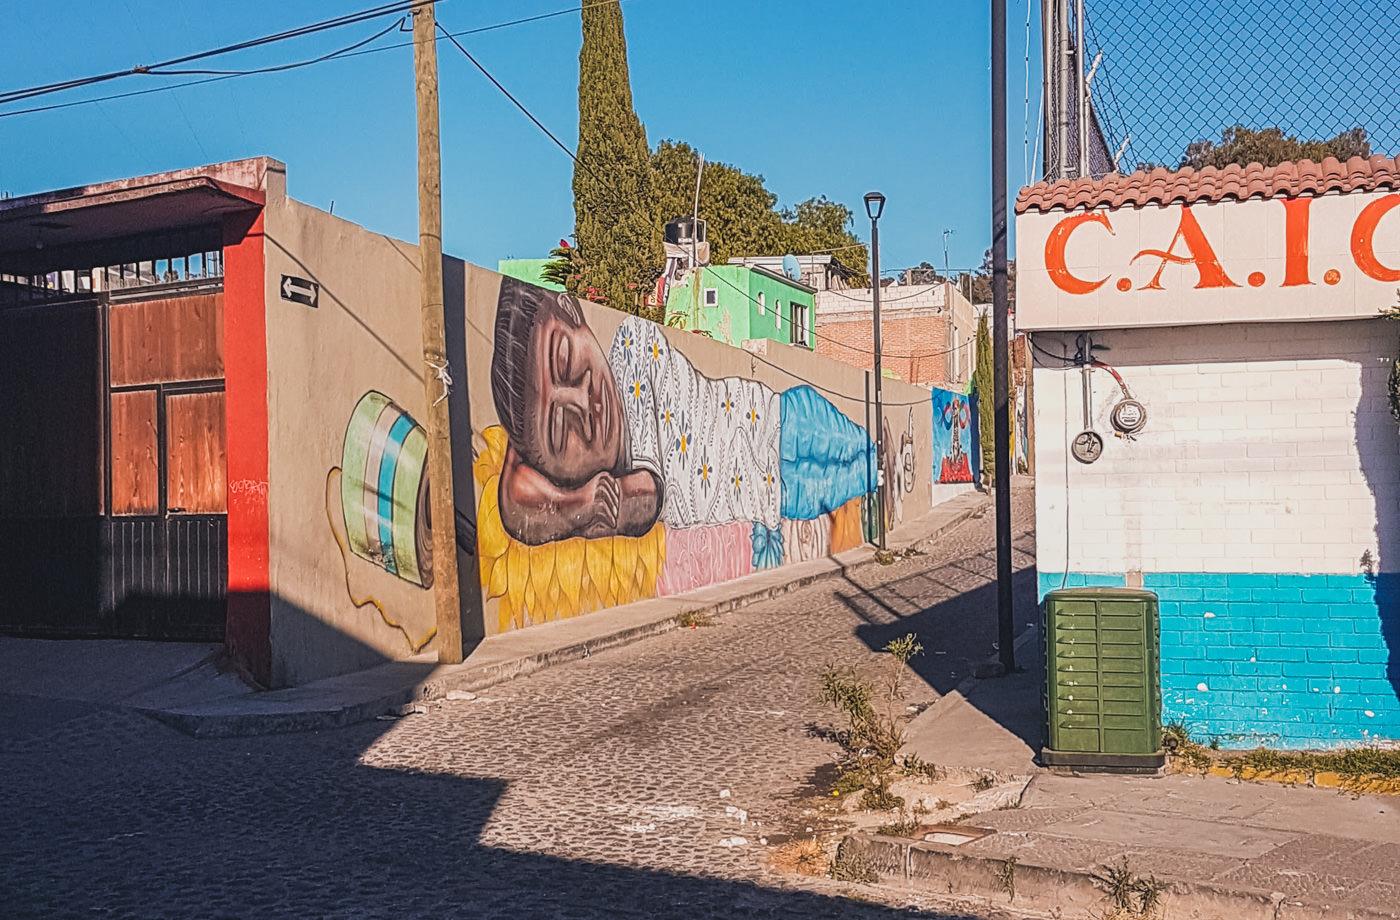 Streetart im Barrio Xanenetla in Puebla in Mexiko